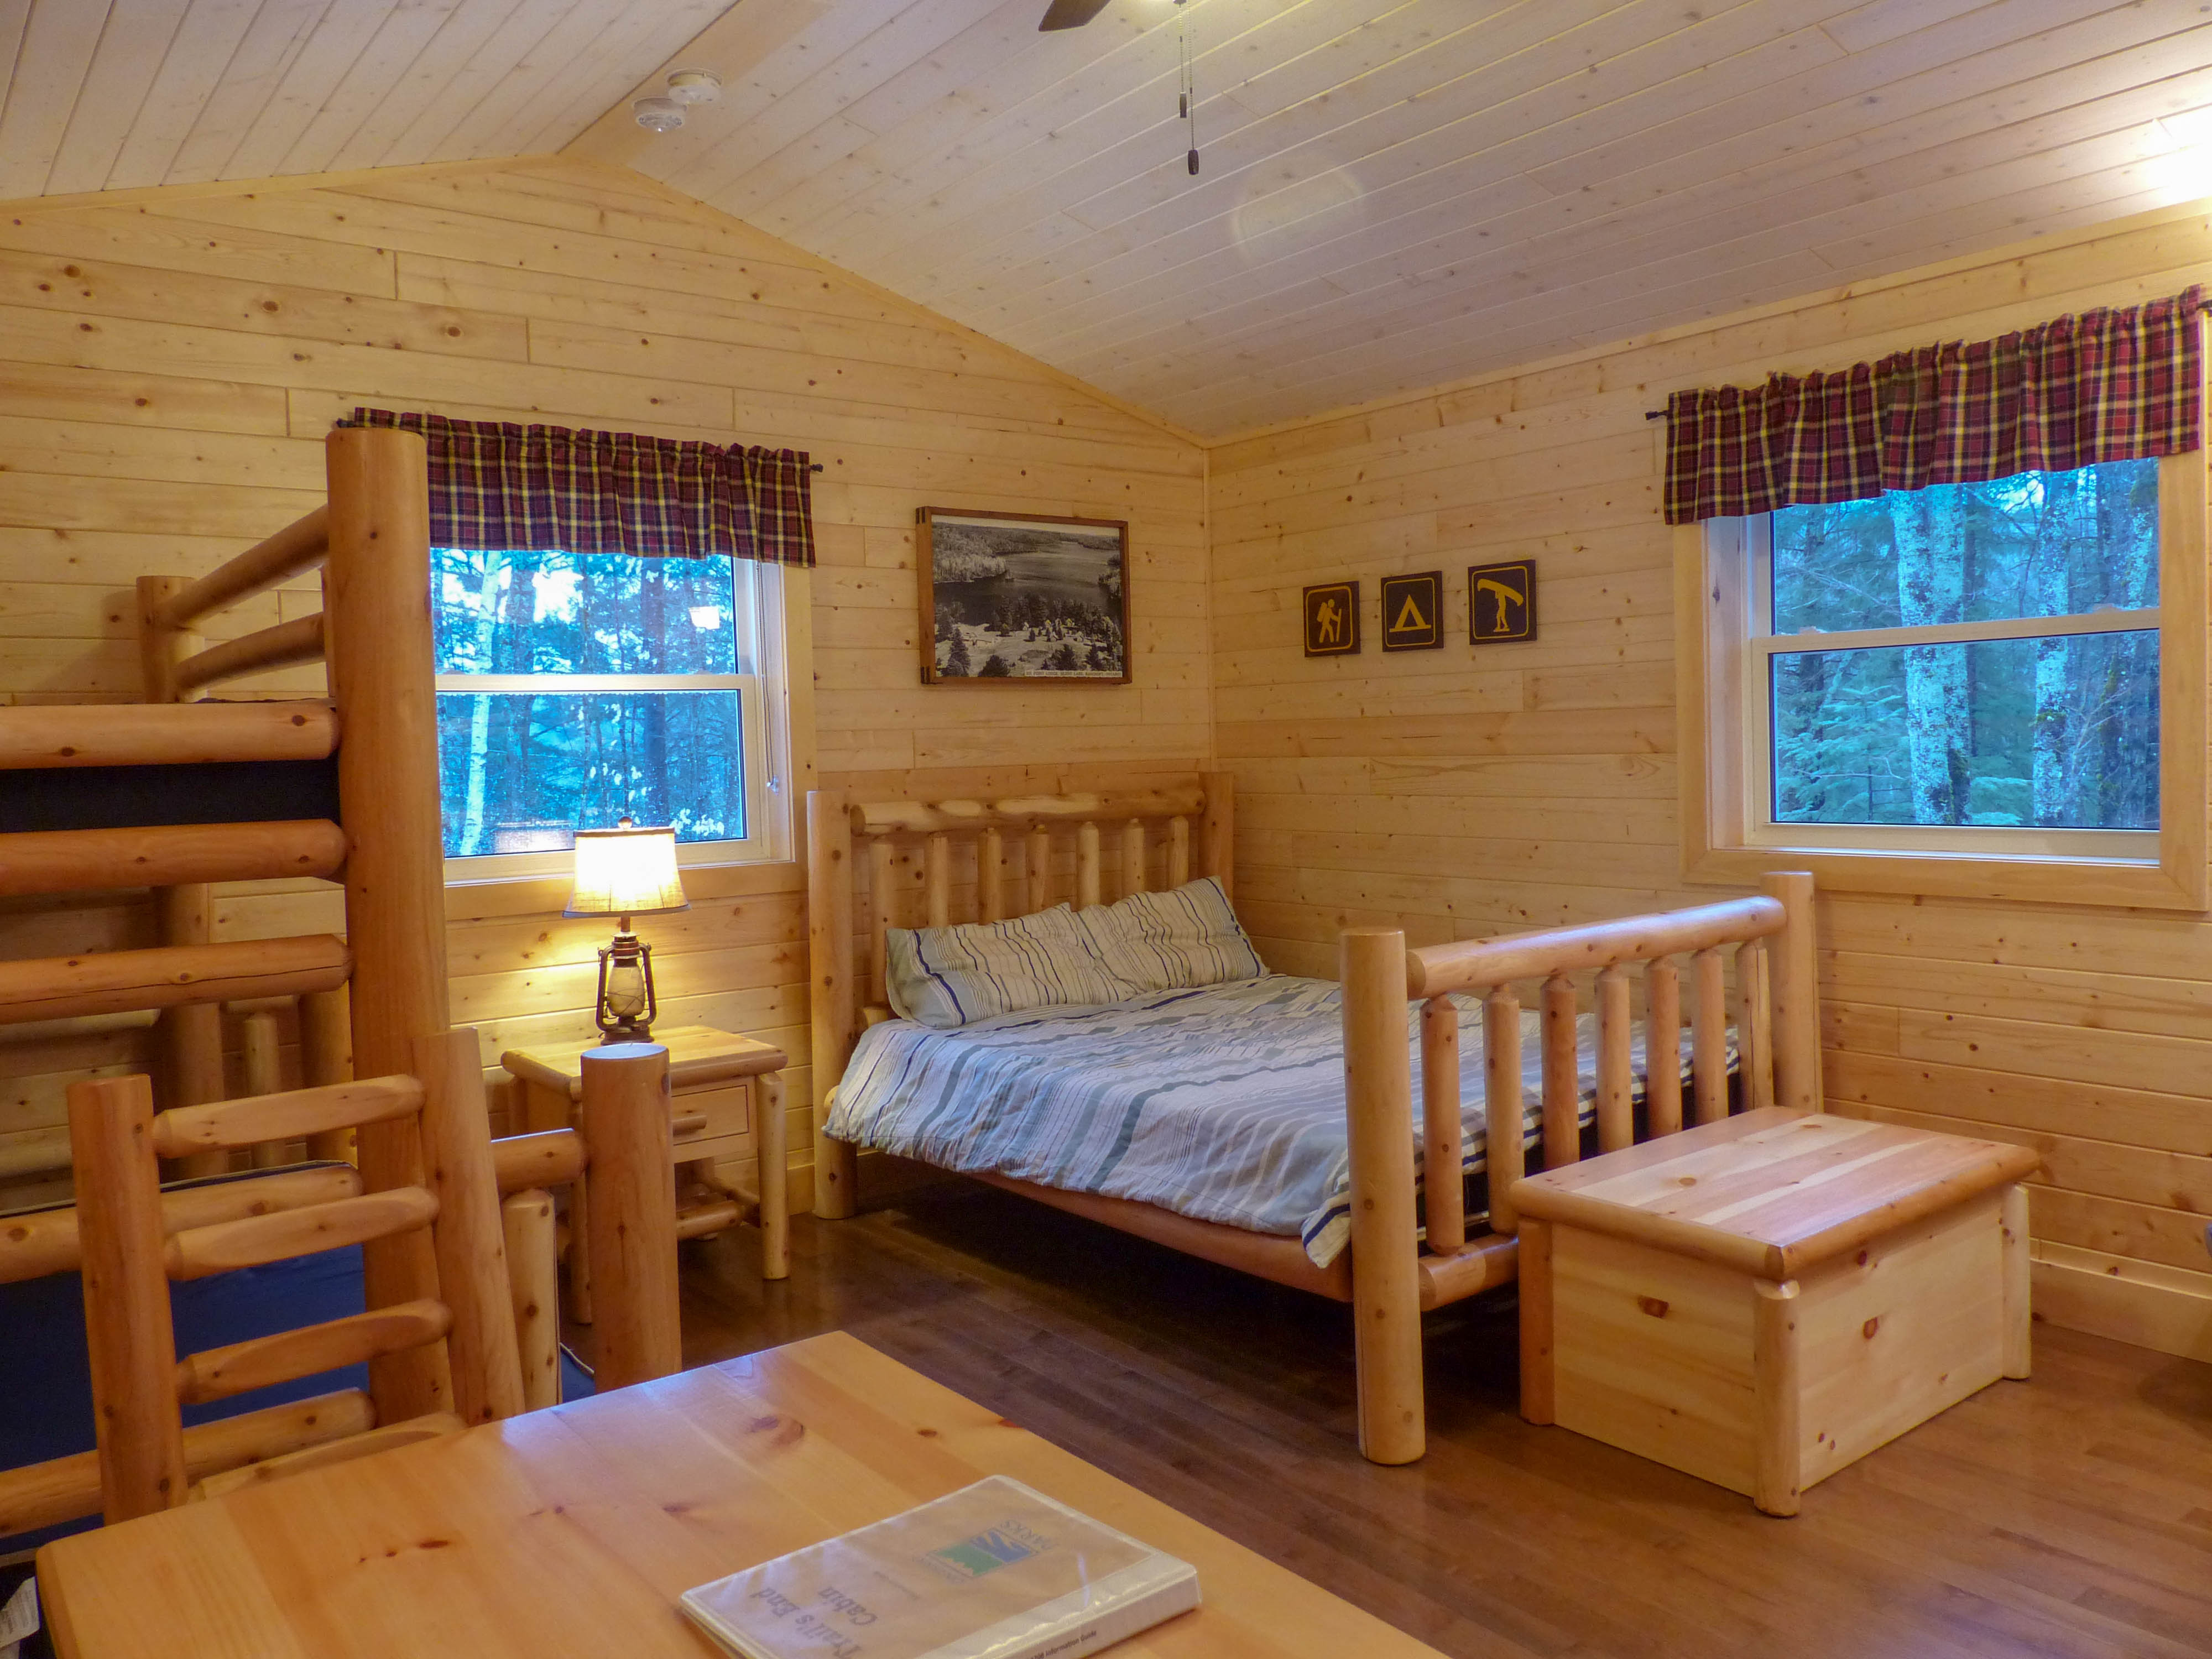 Silent Lake Provincial Park camp cabin interior